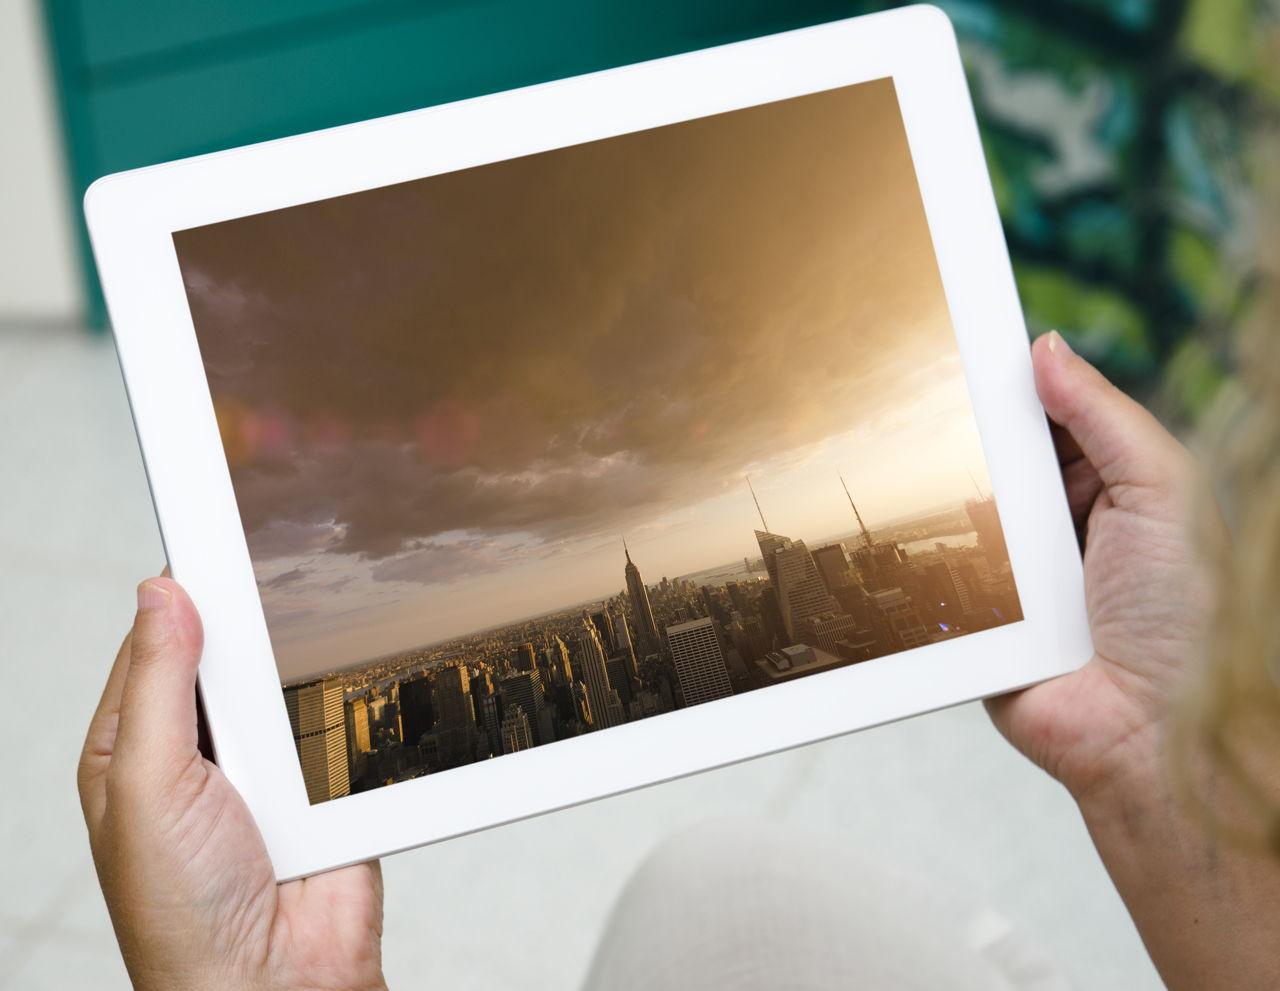 Kindle Fire Vs. iPad 2 Vs. Samsung Galaxy Tab 10.1